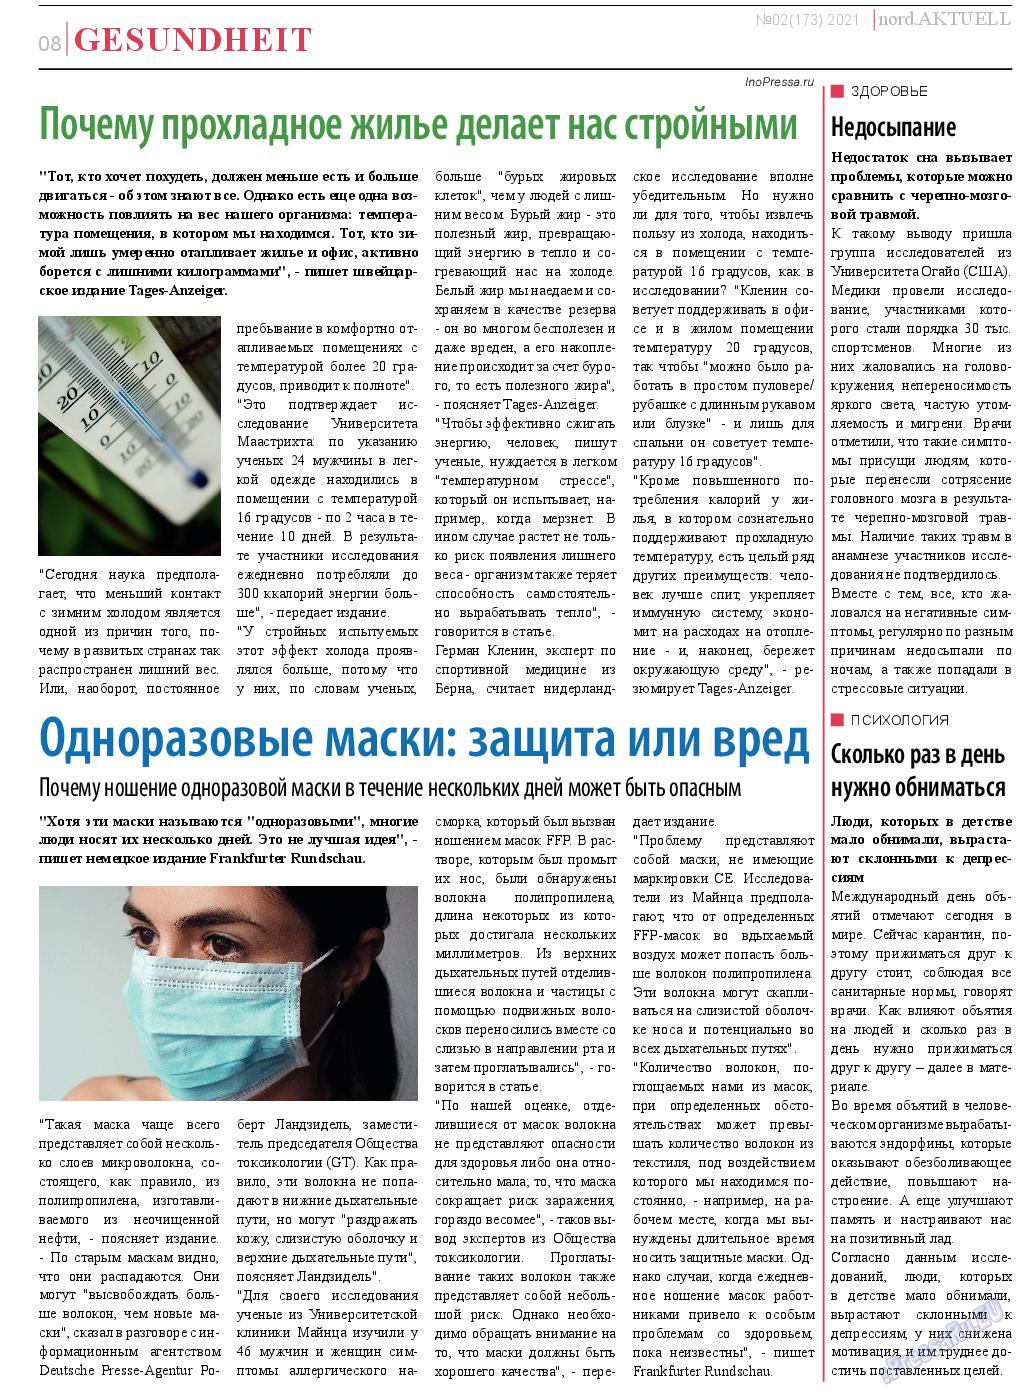 nord.Aktuell (газета). 2021 год, номер 2, стр. 8